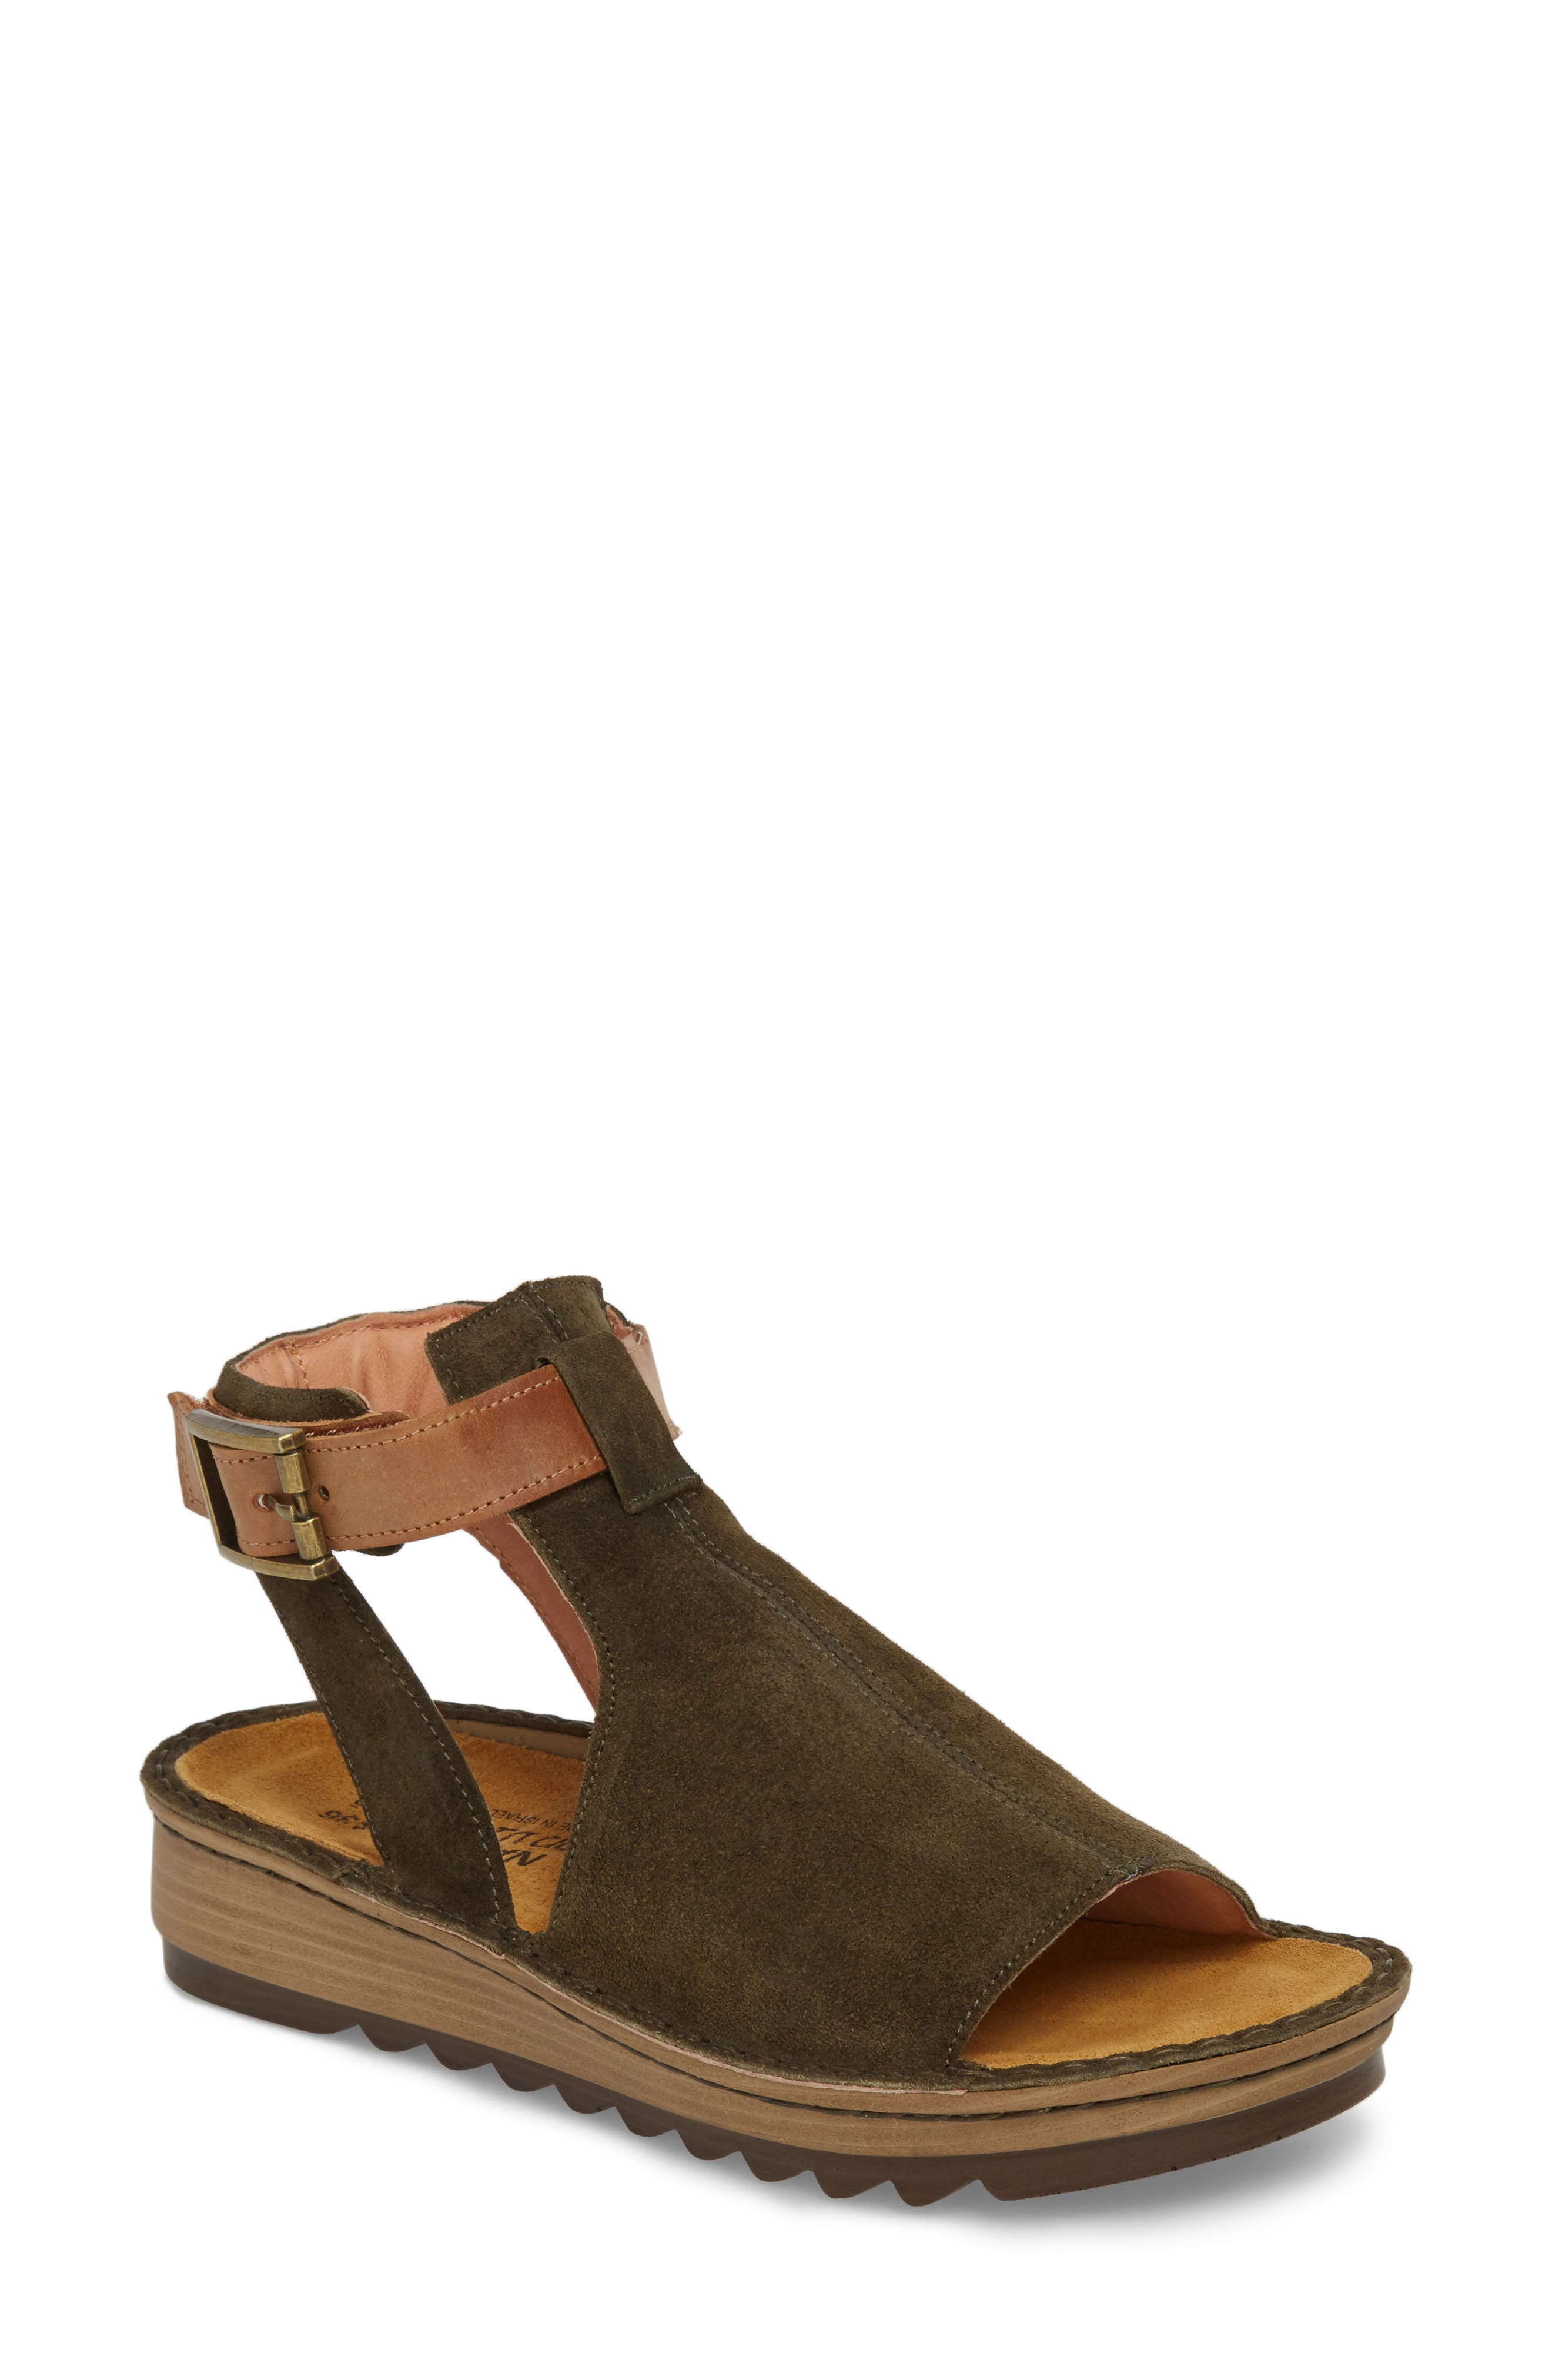 Alternate Image 1 Selected - Naot Verbena Sandal (Women)